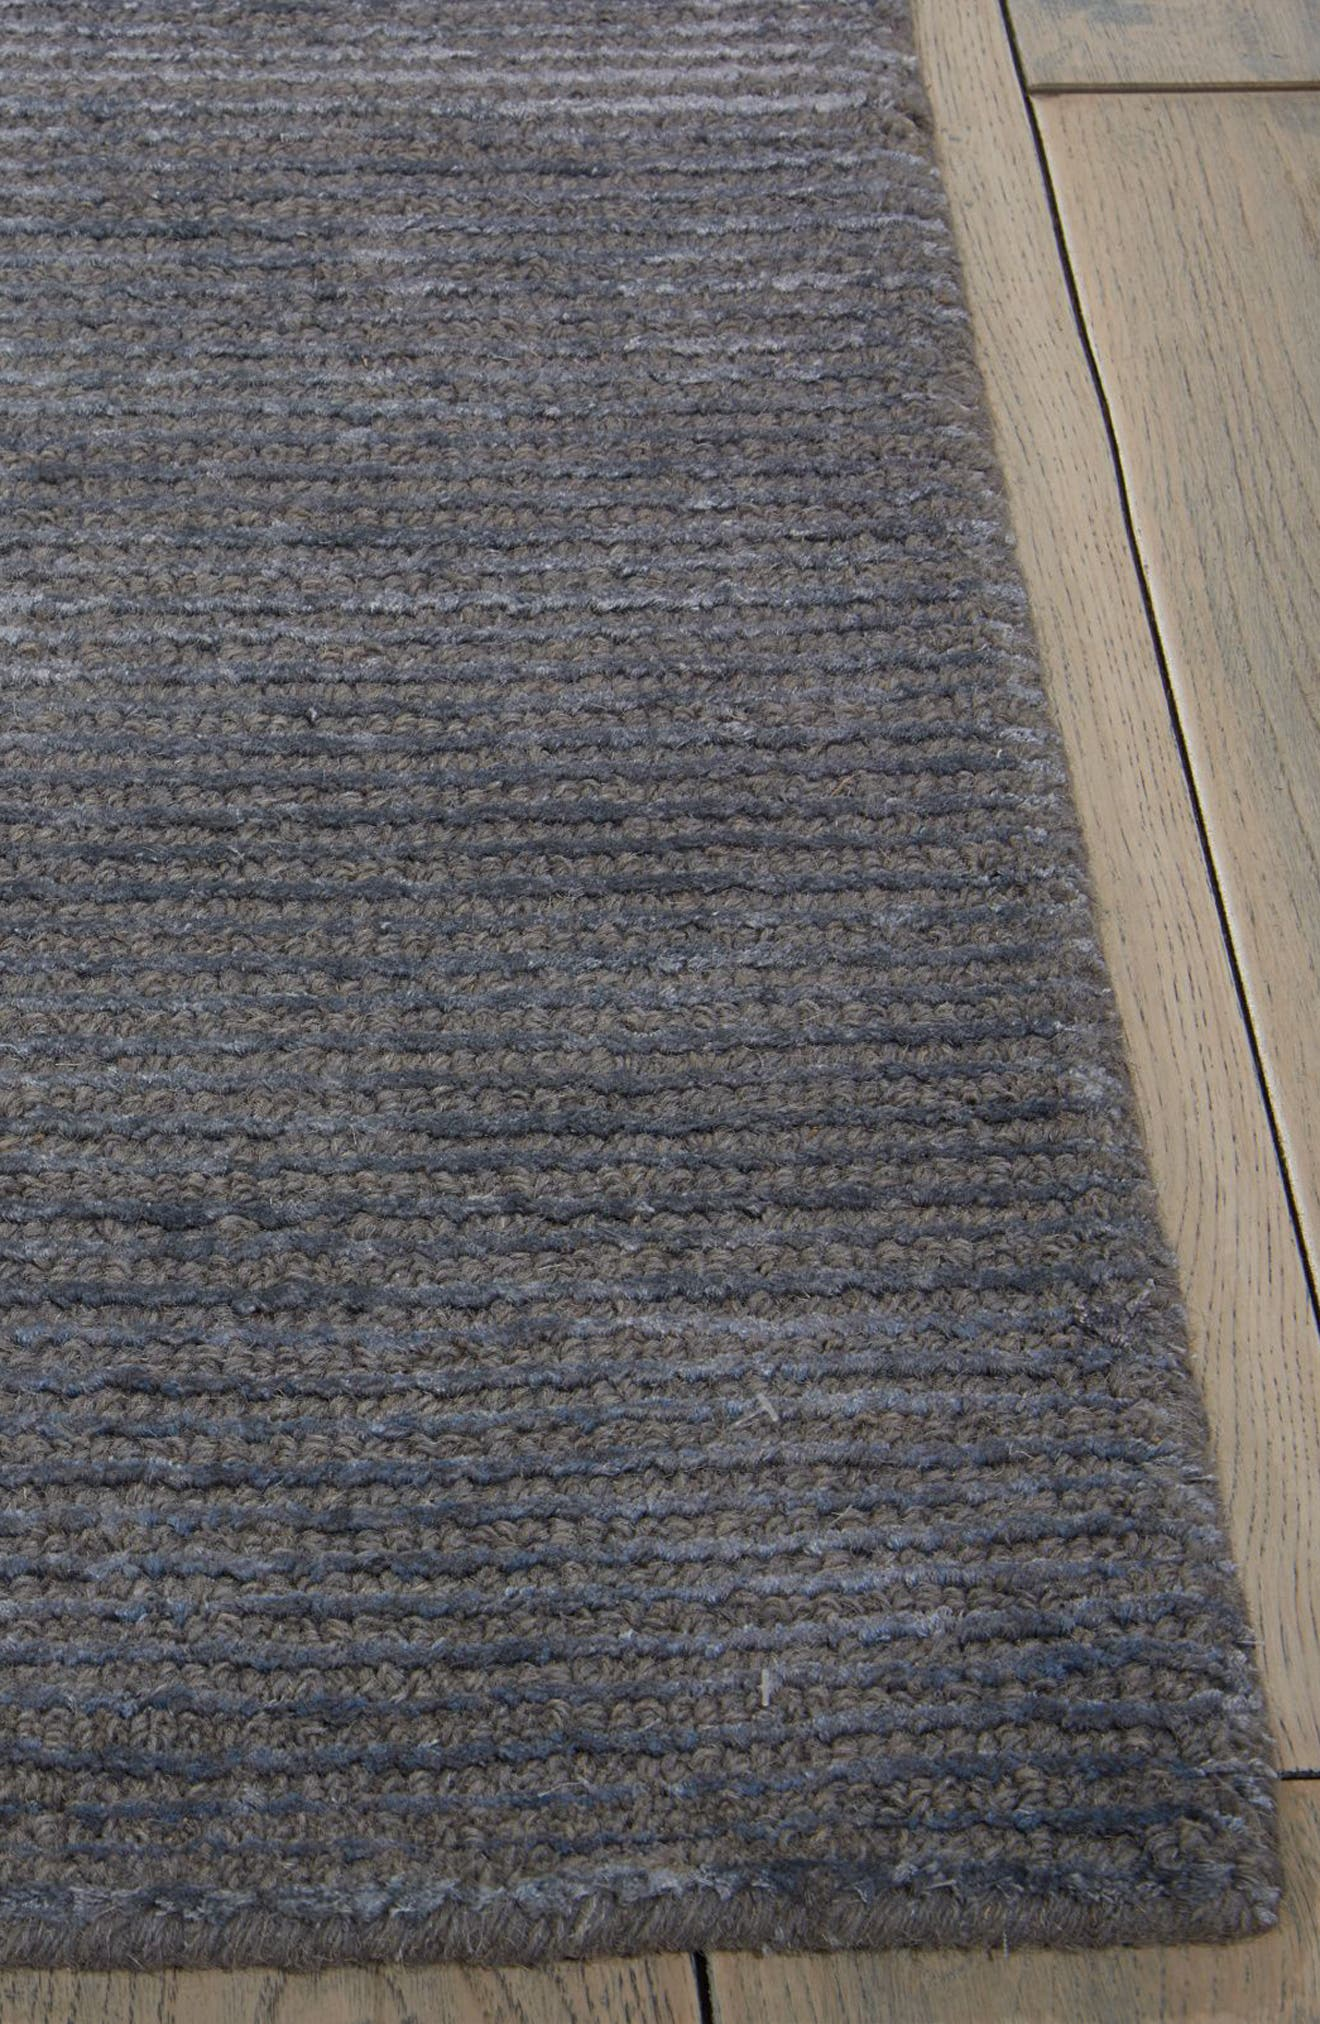 Ravine Furrow Handwoven Area Rug,                             Alternate thumbnail 3, color,                             Dusk